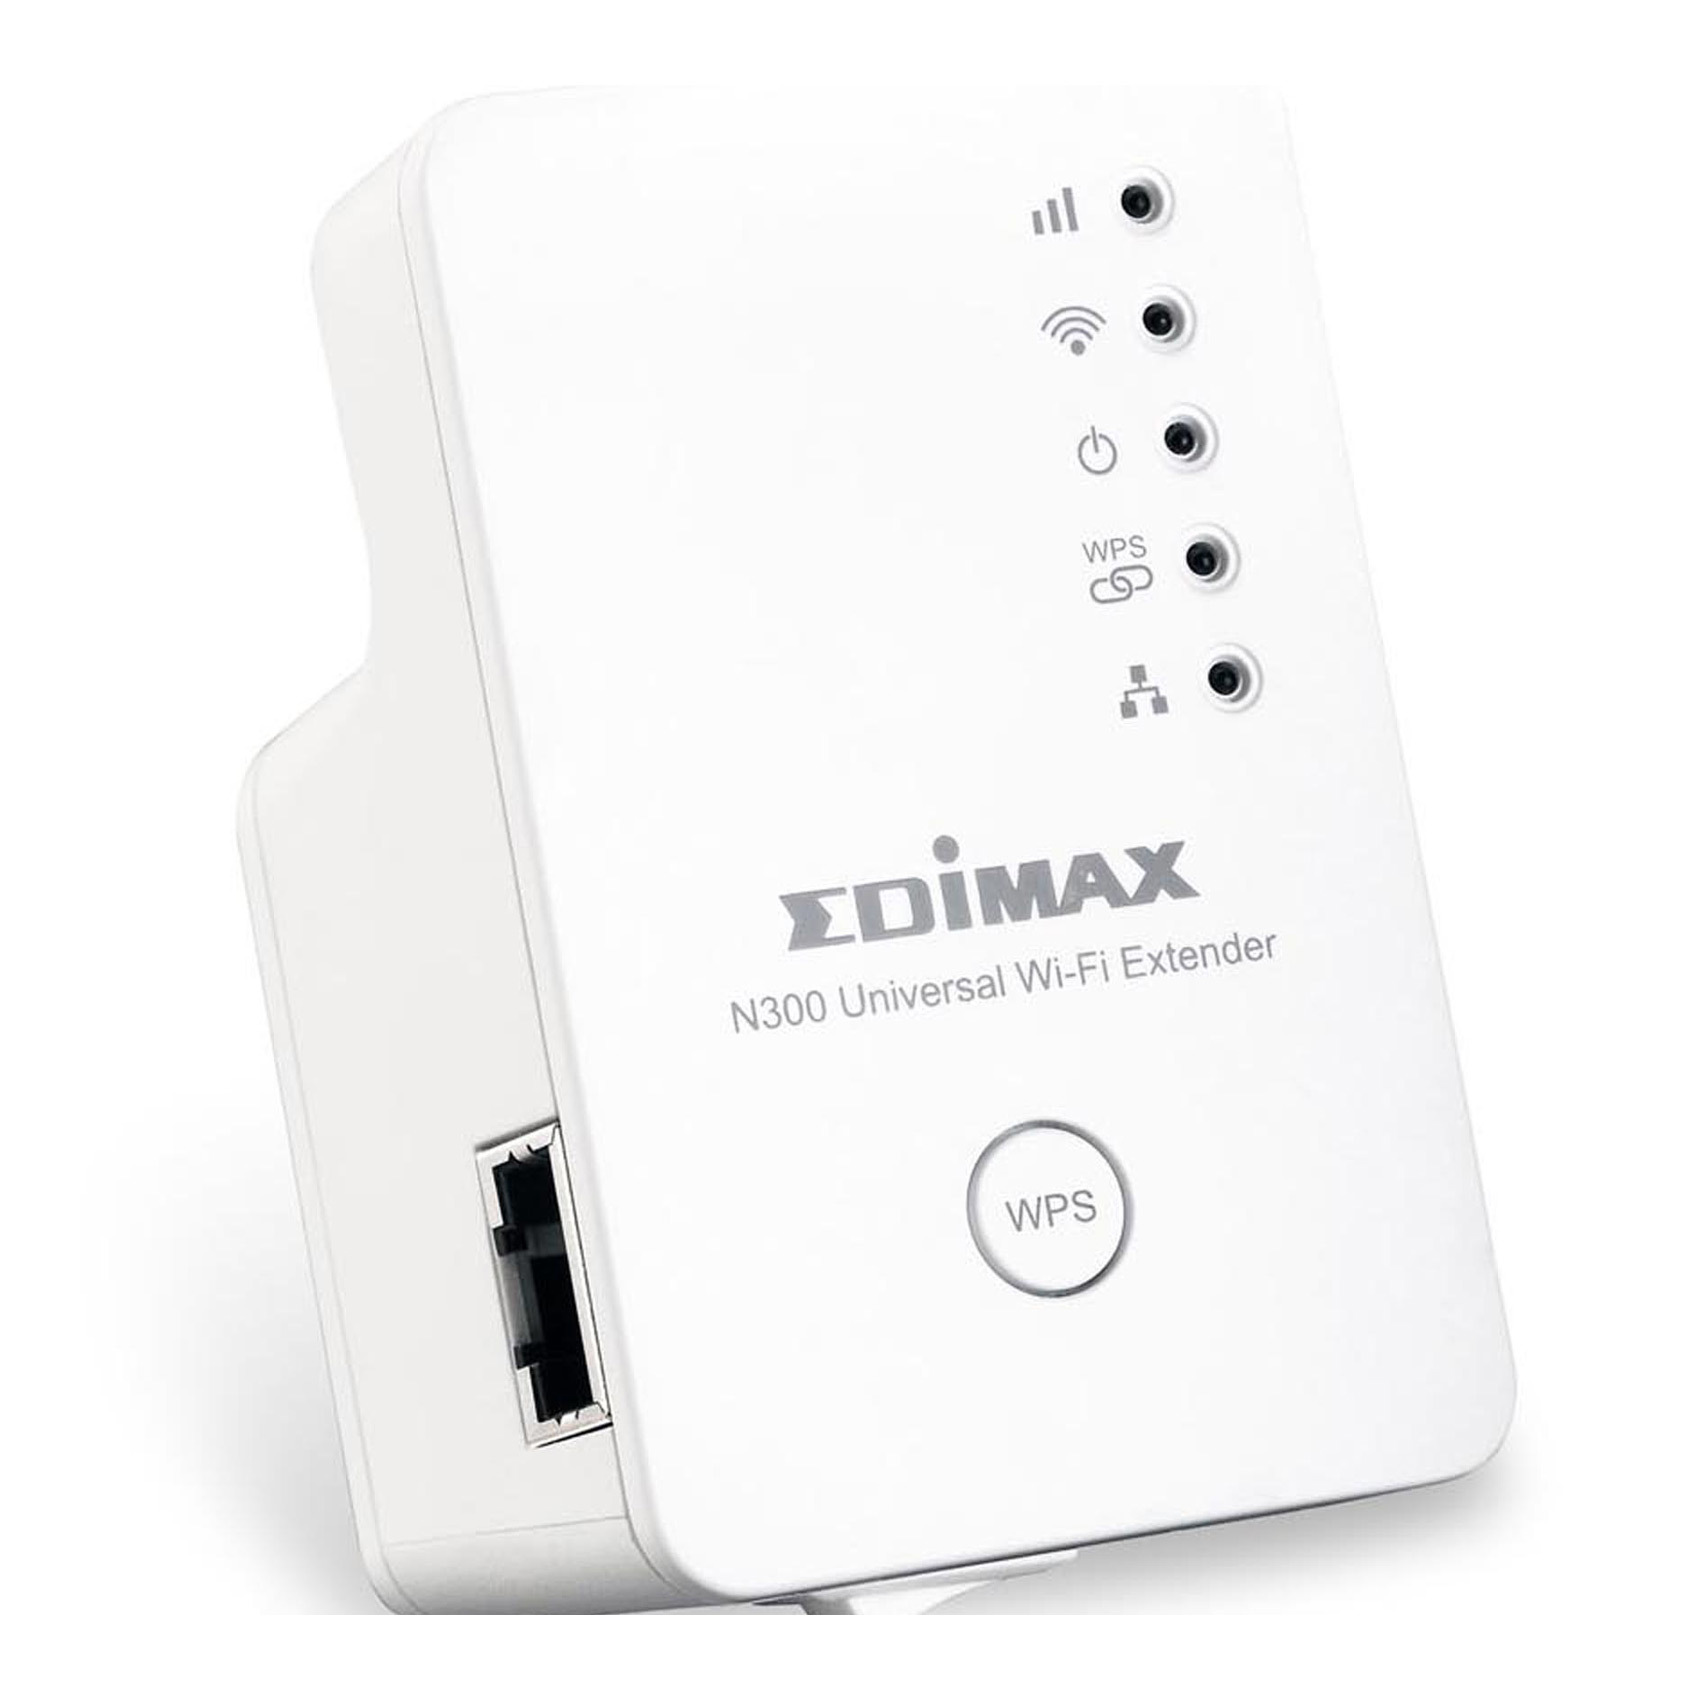 EDIMAX W/L RE UNI 7438